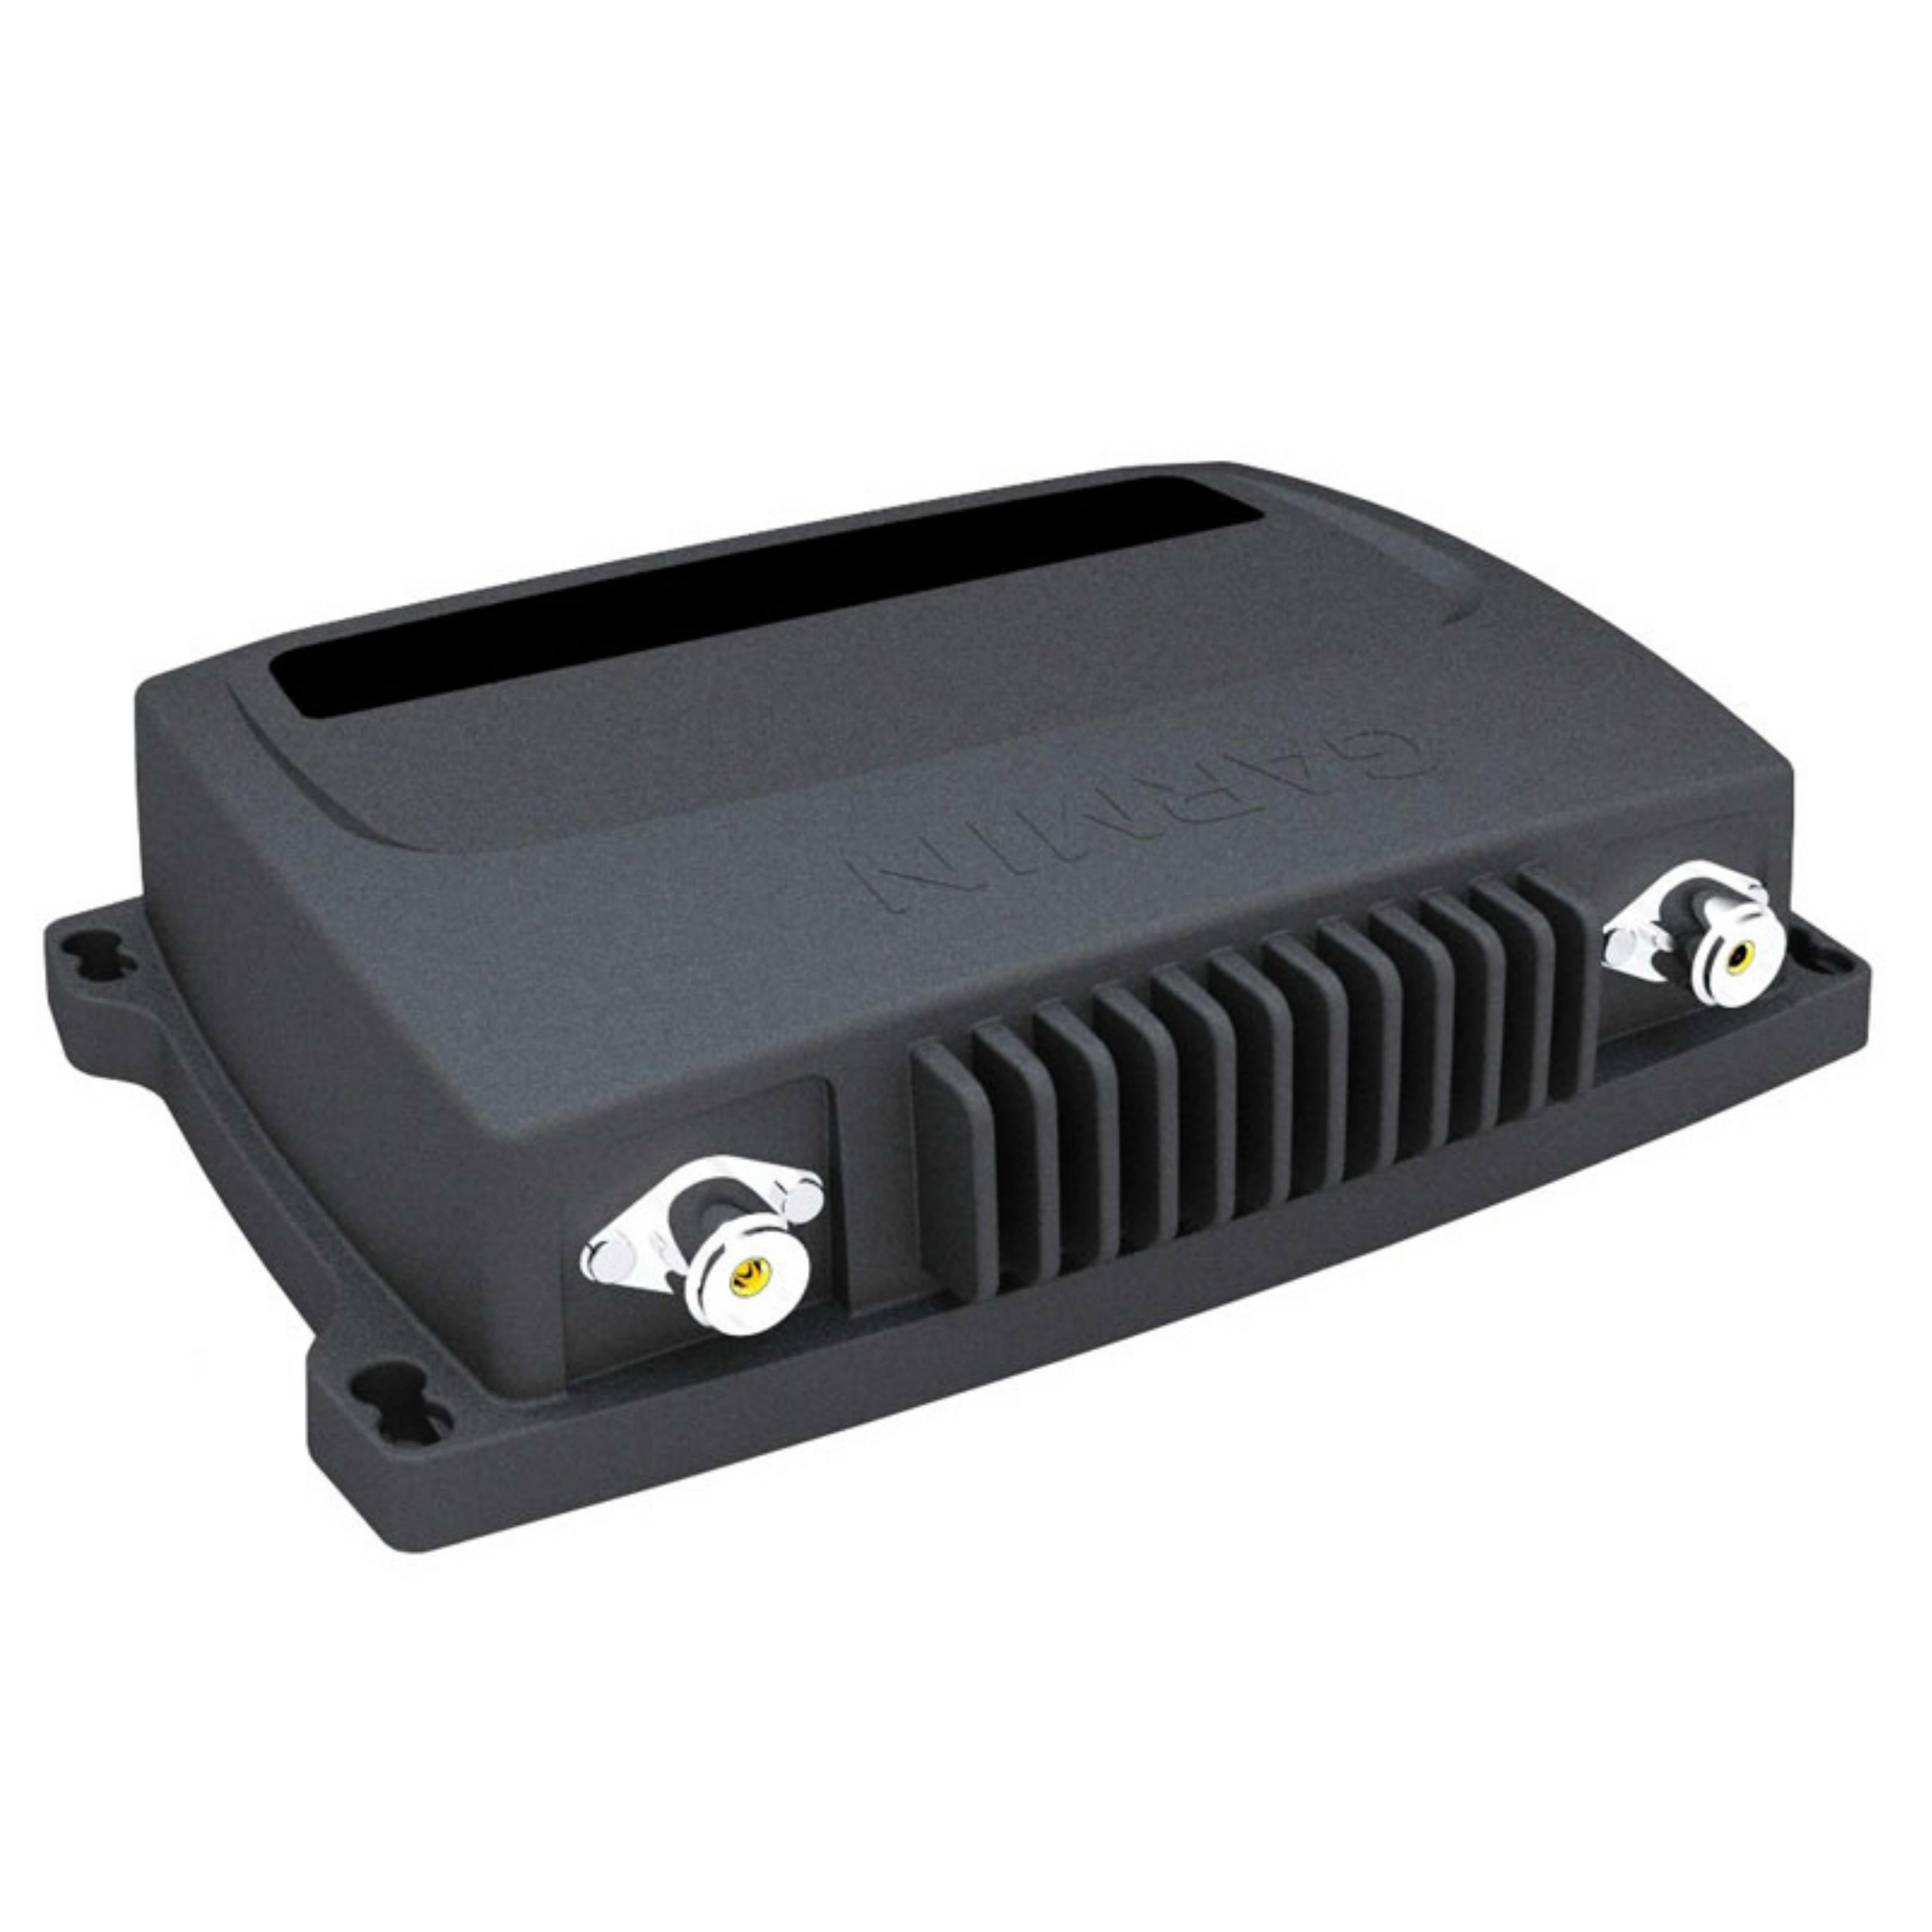 Garmin-0100086500|AIS 600 Class B Transponder|Blackbox Transceiver|Class  A&B|CPA